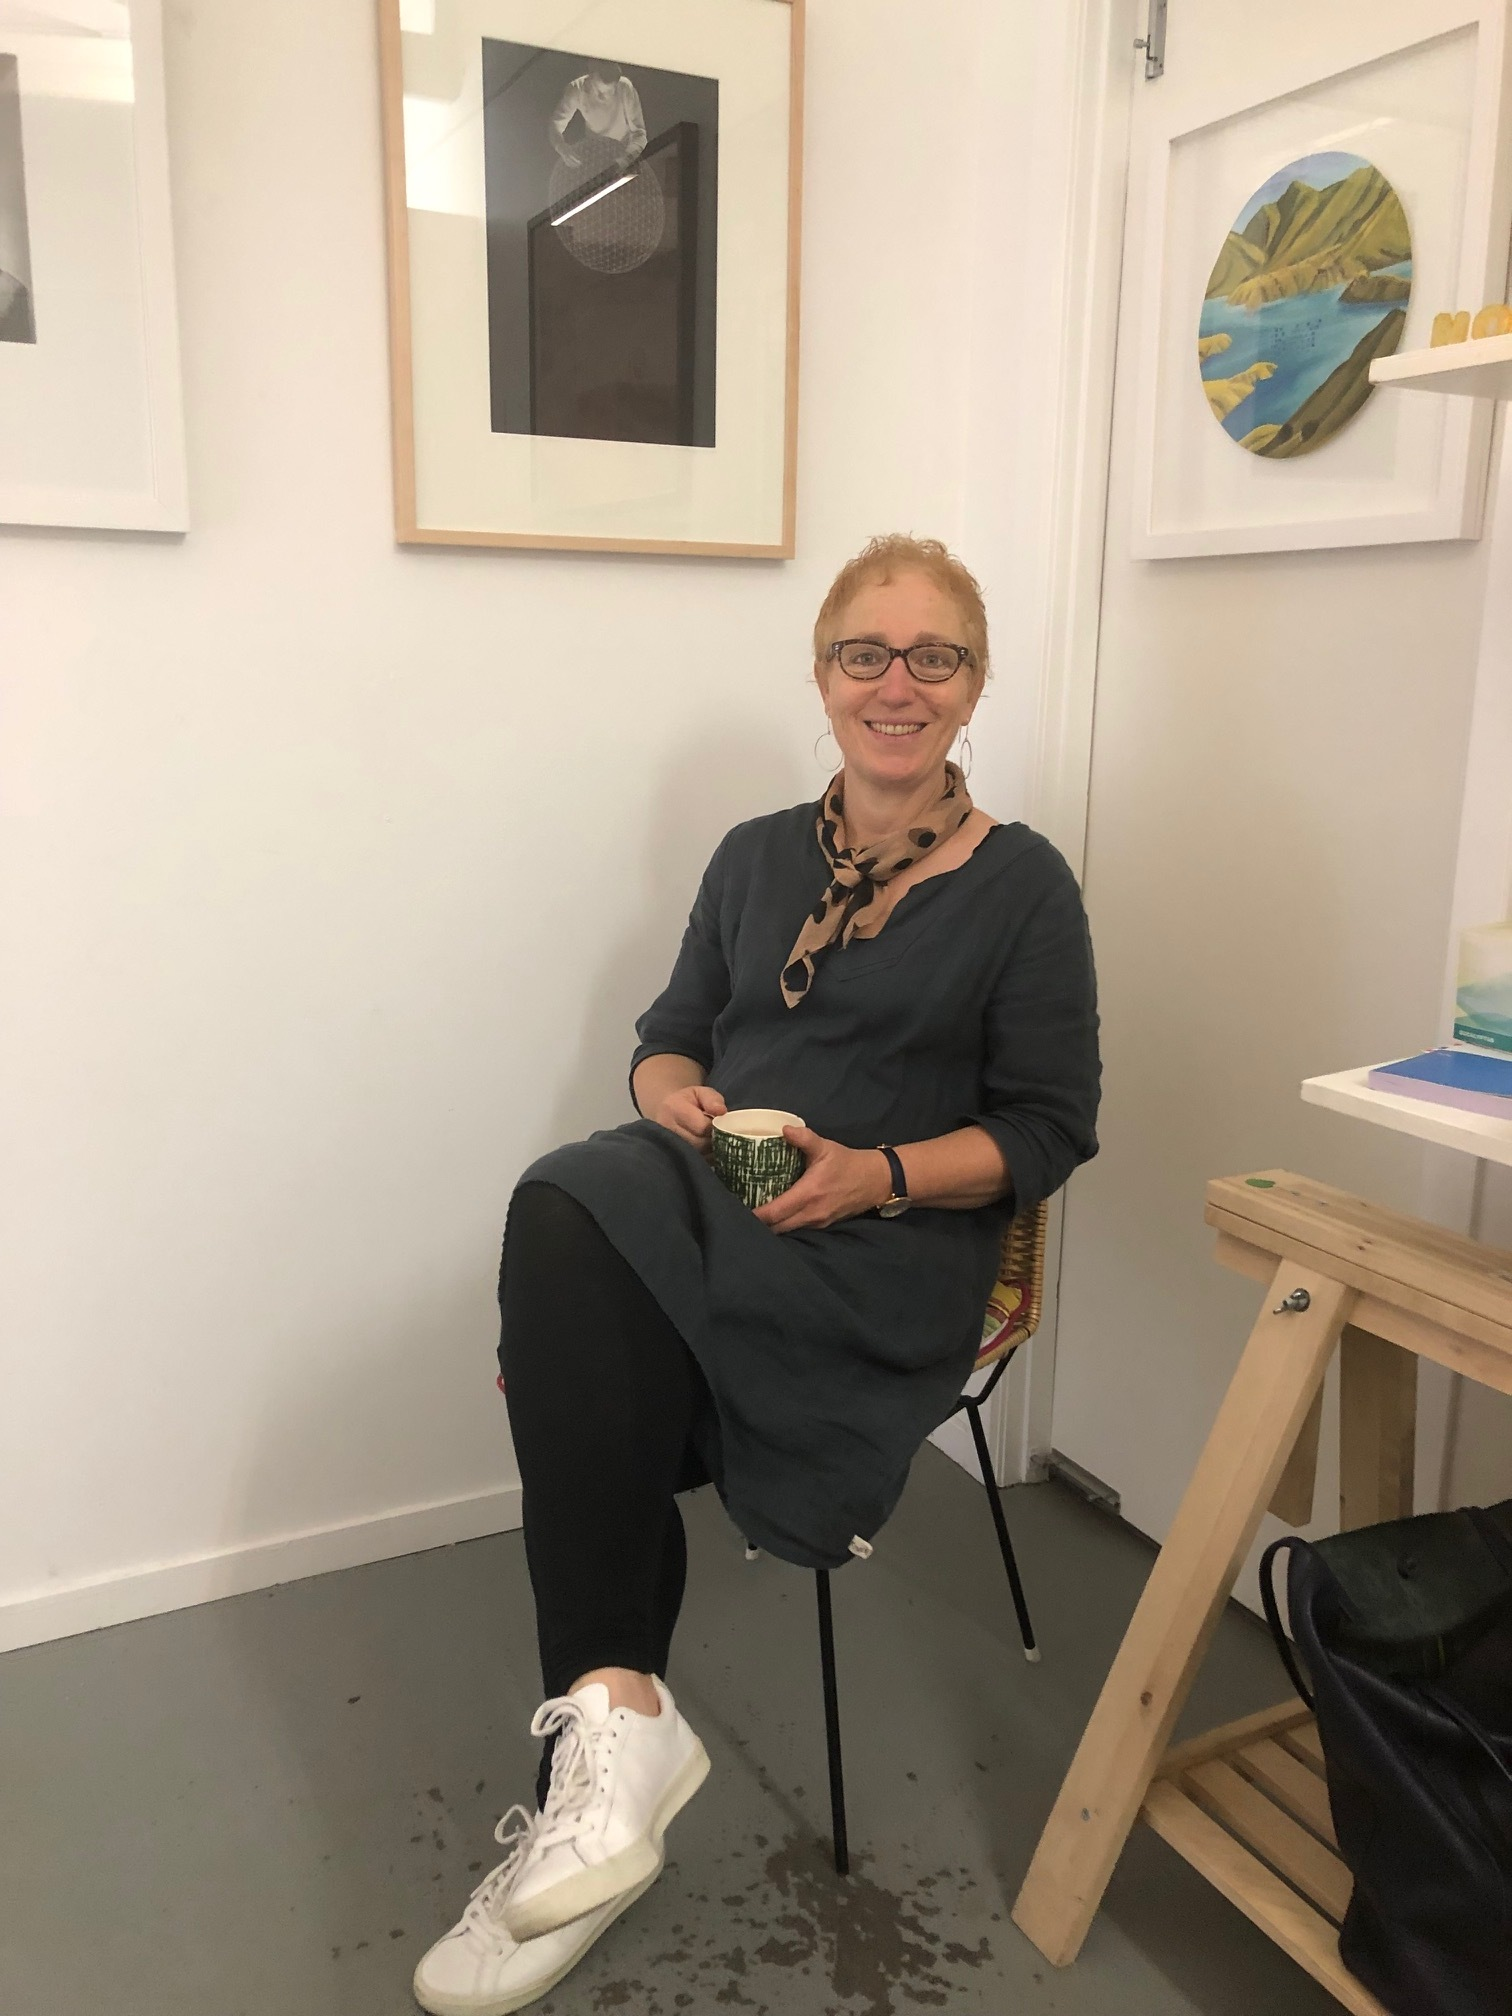 Karin Strachan - Gallery owner